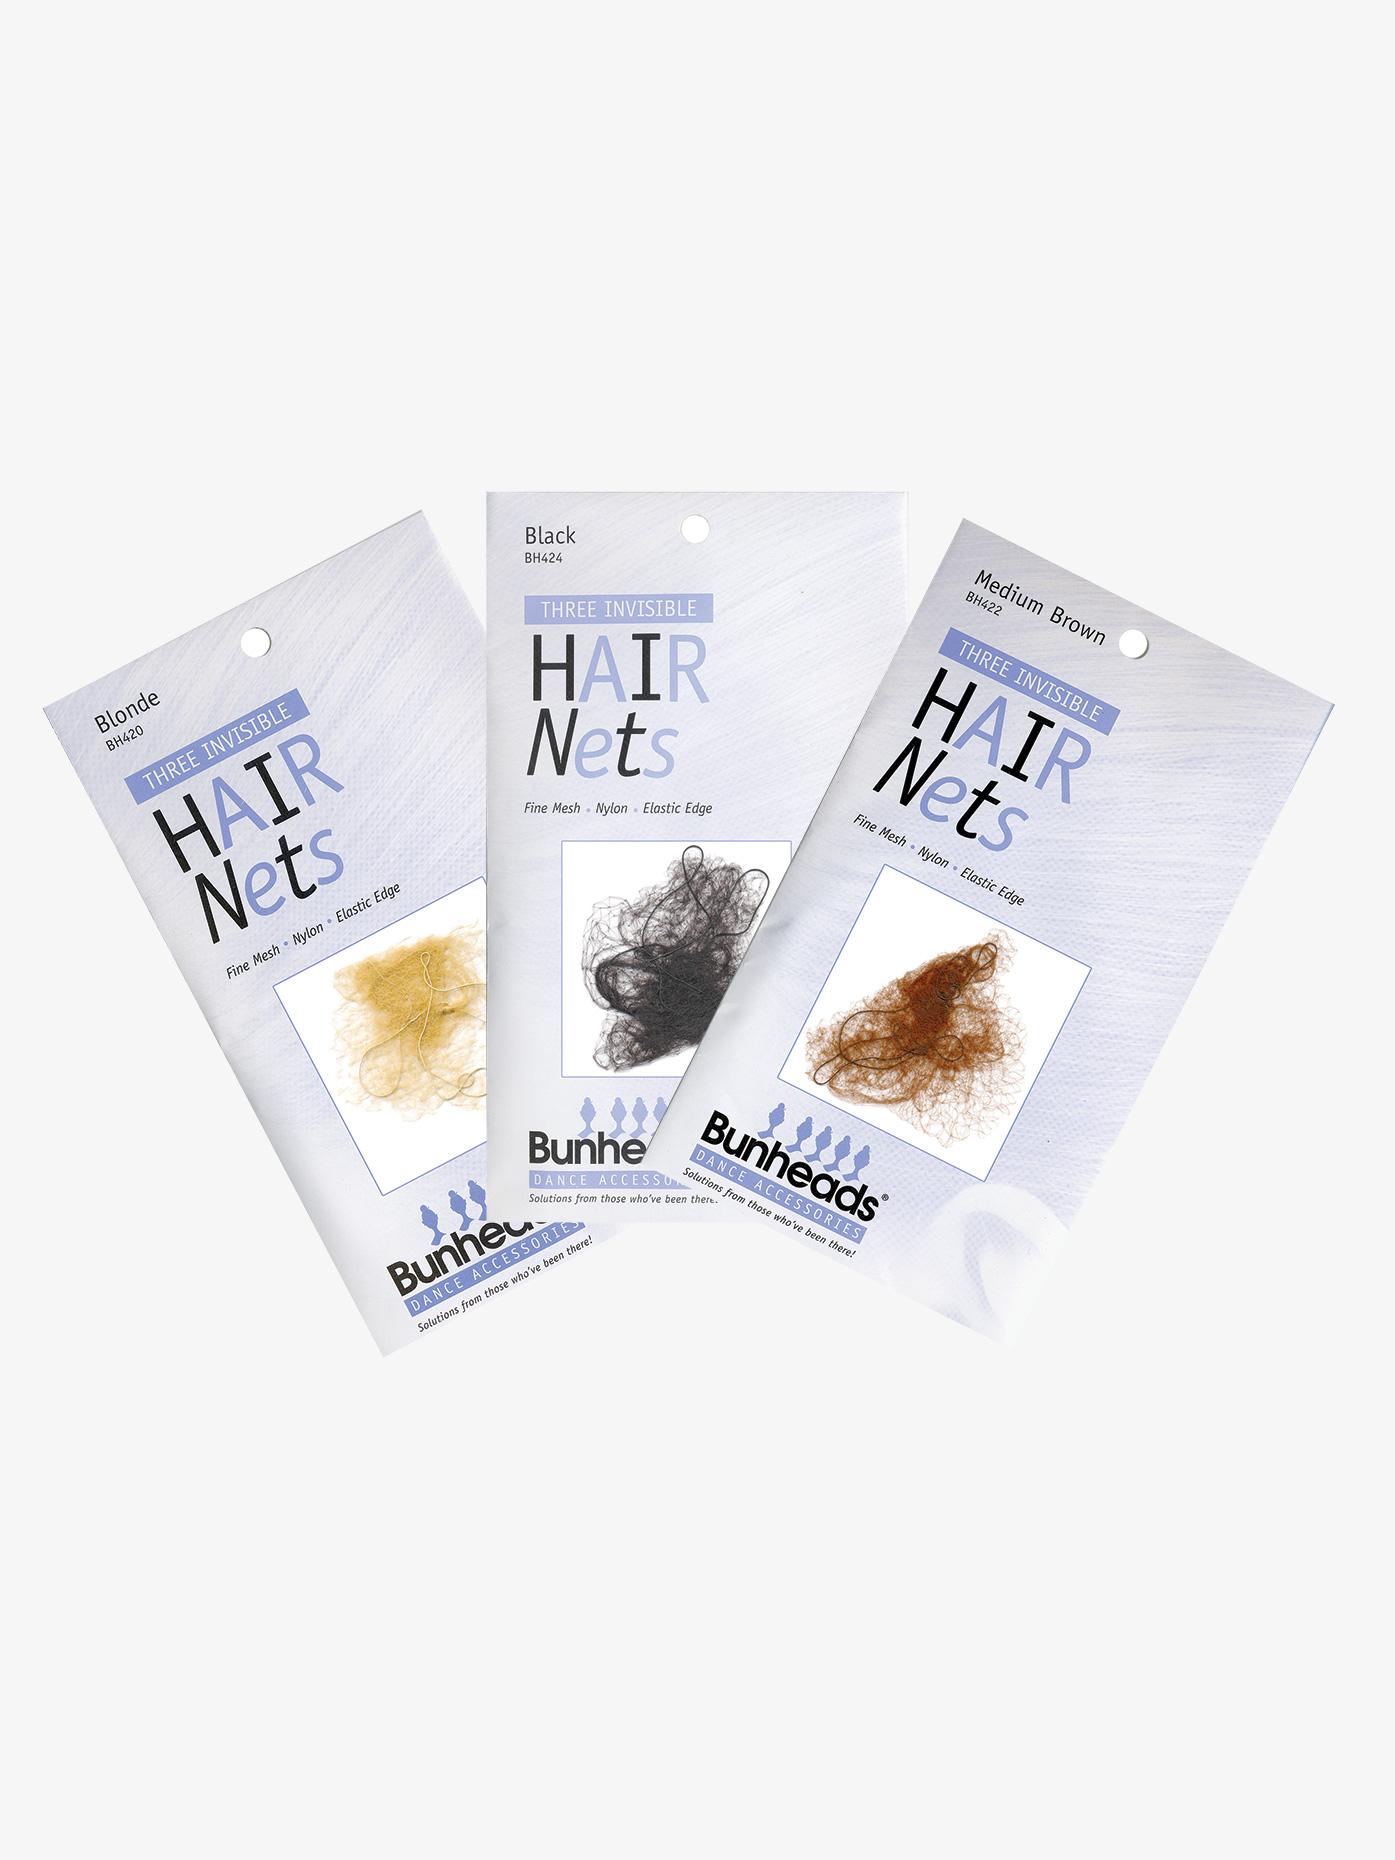 Bunheads Hair Nets 3 Pack (9 Nets) BH420K